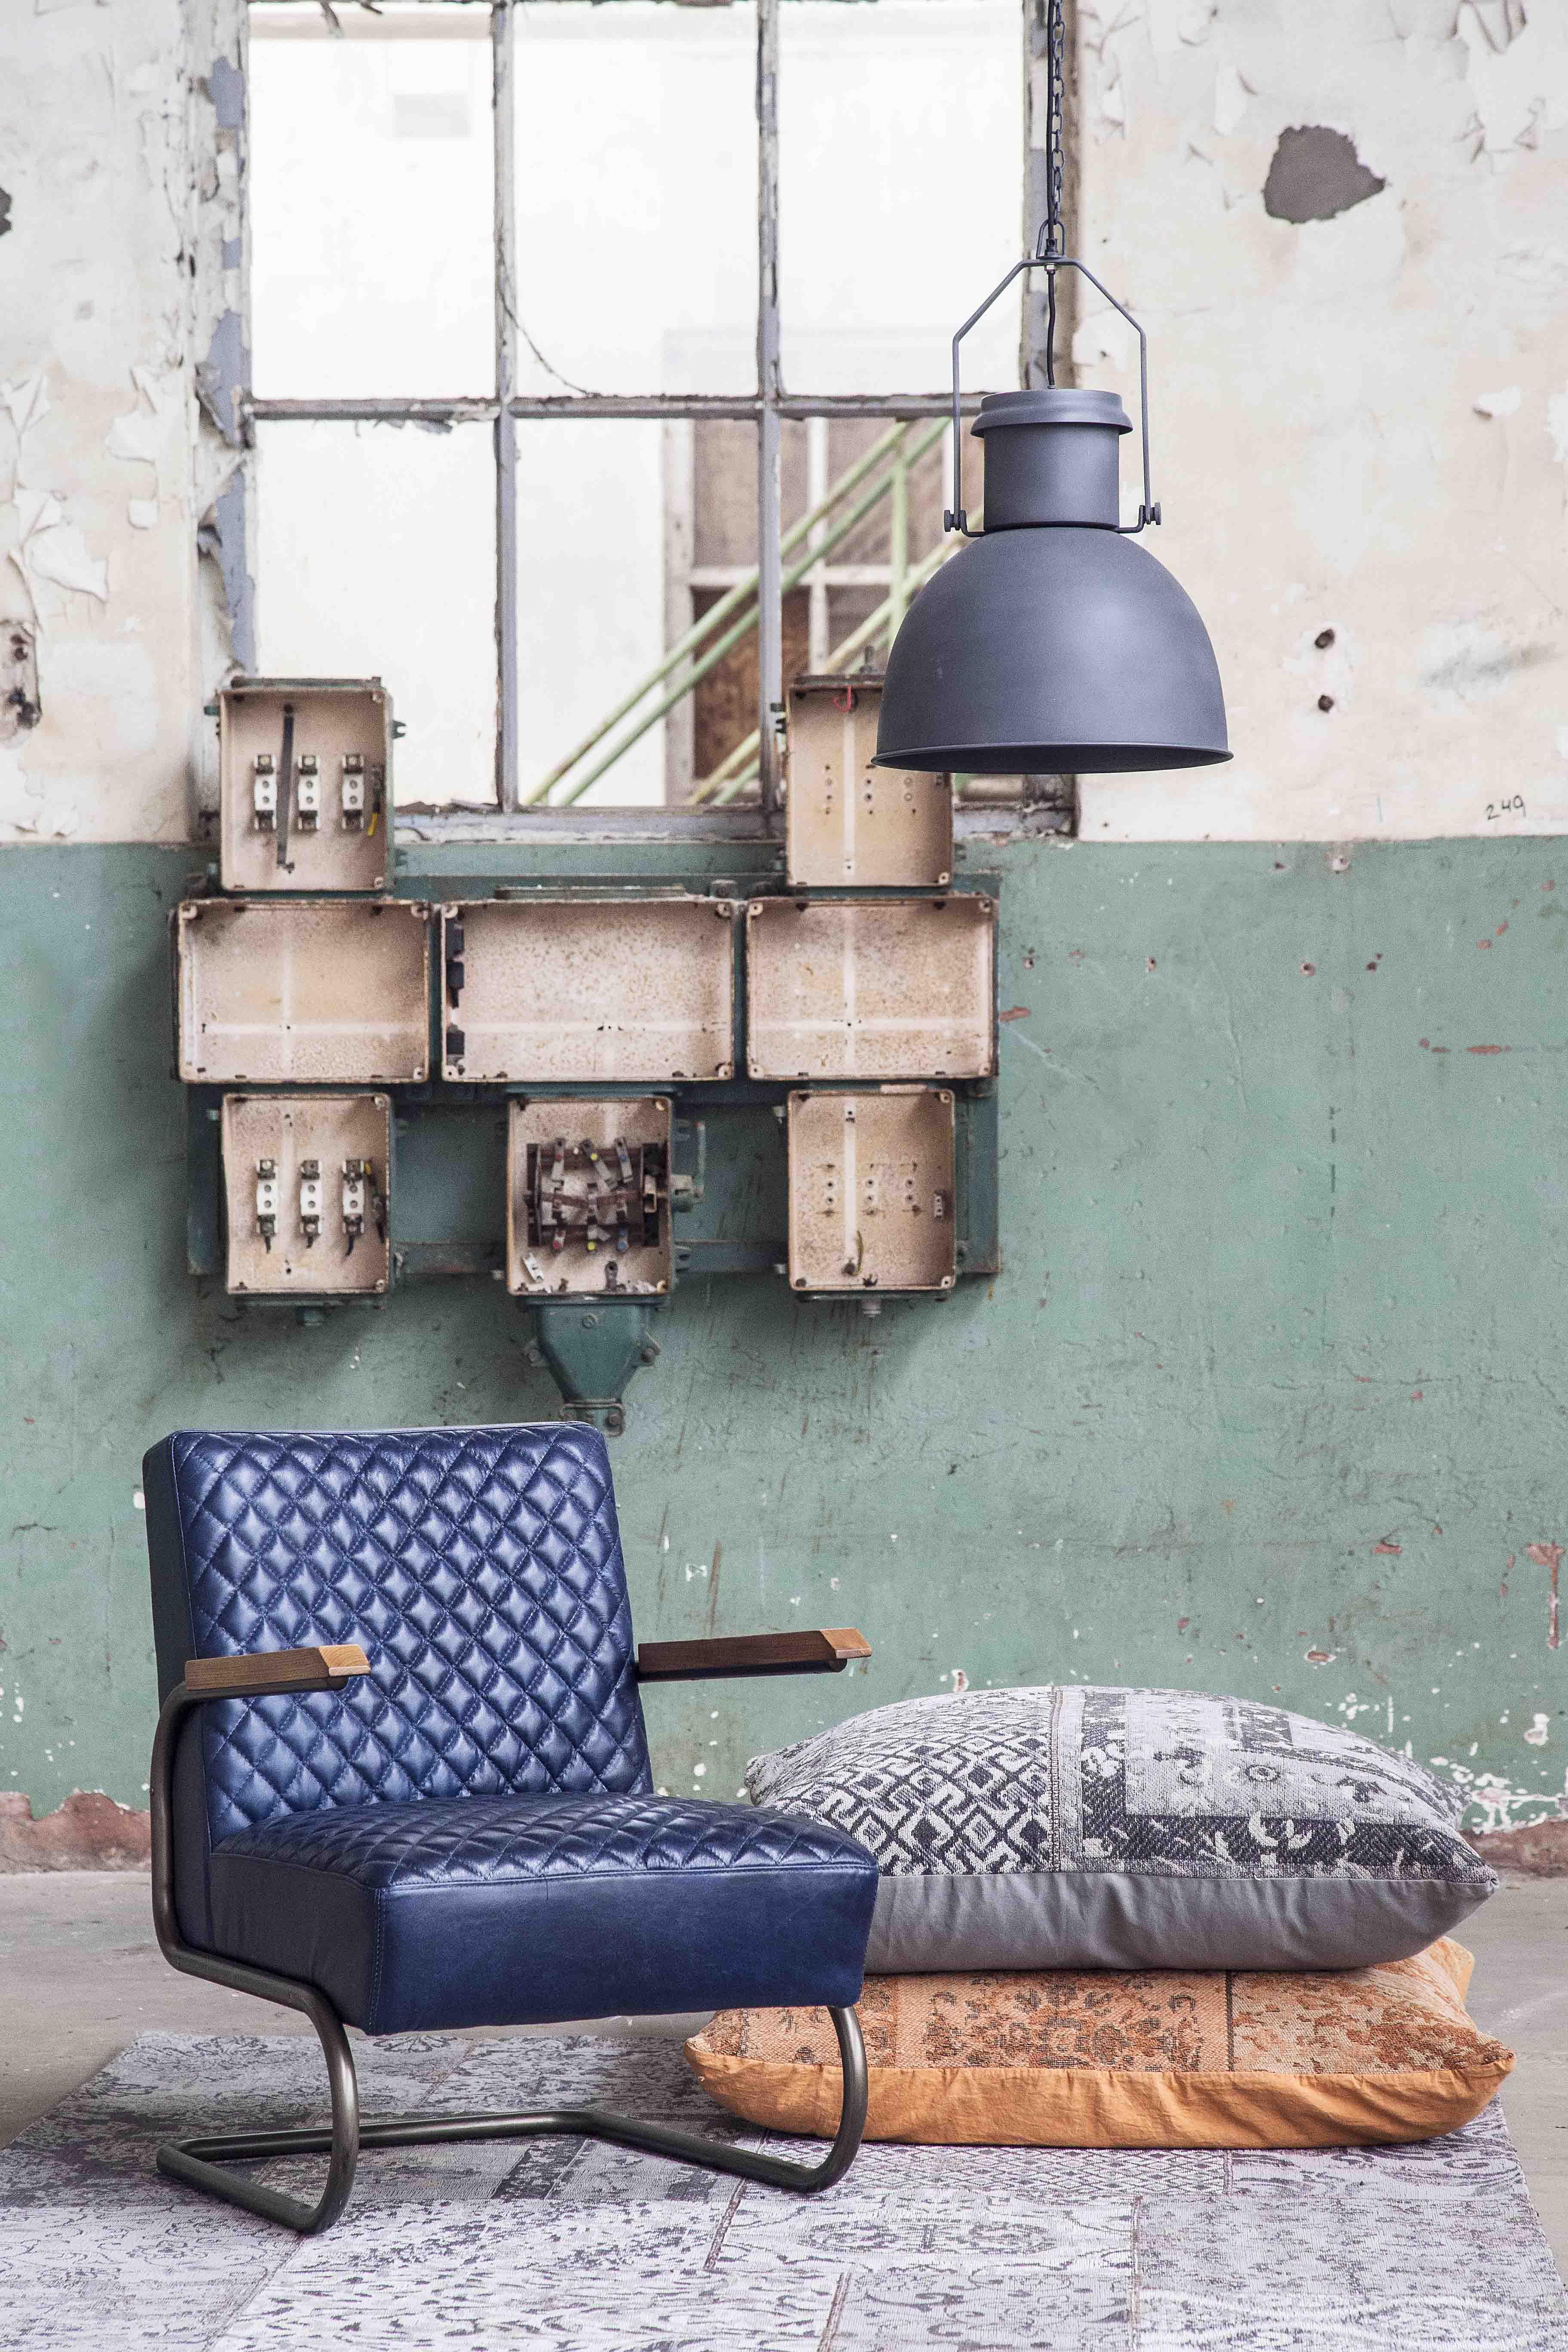 Haal meer blauw in huis! – Furnlovers.nl